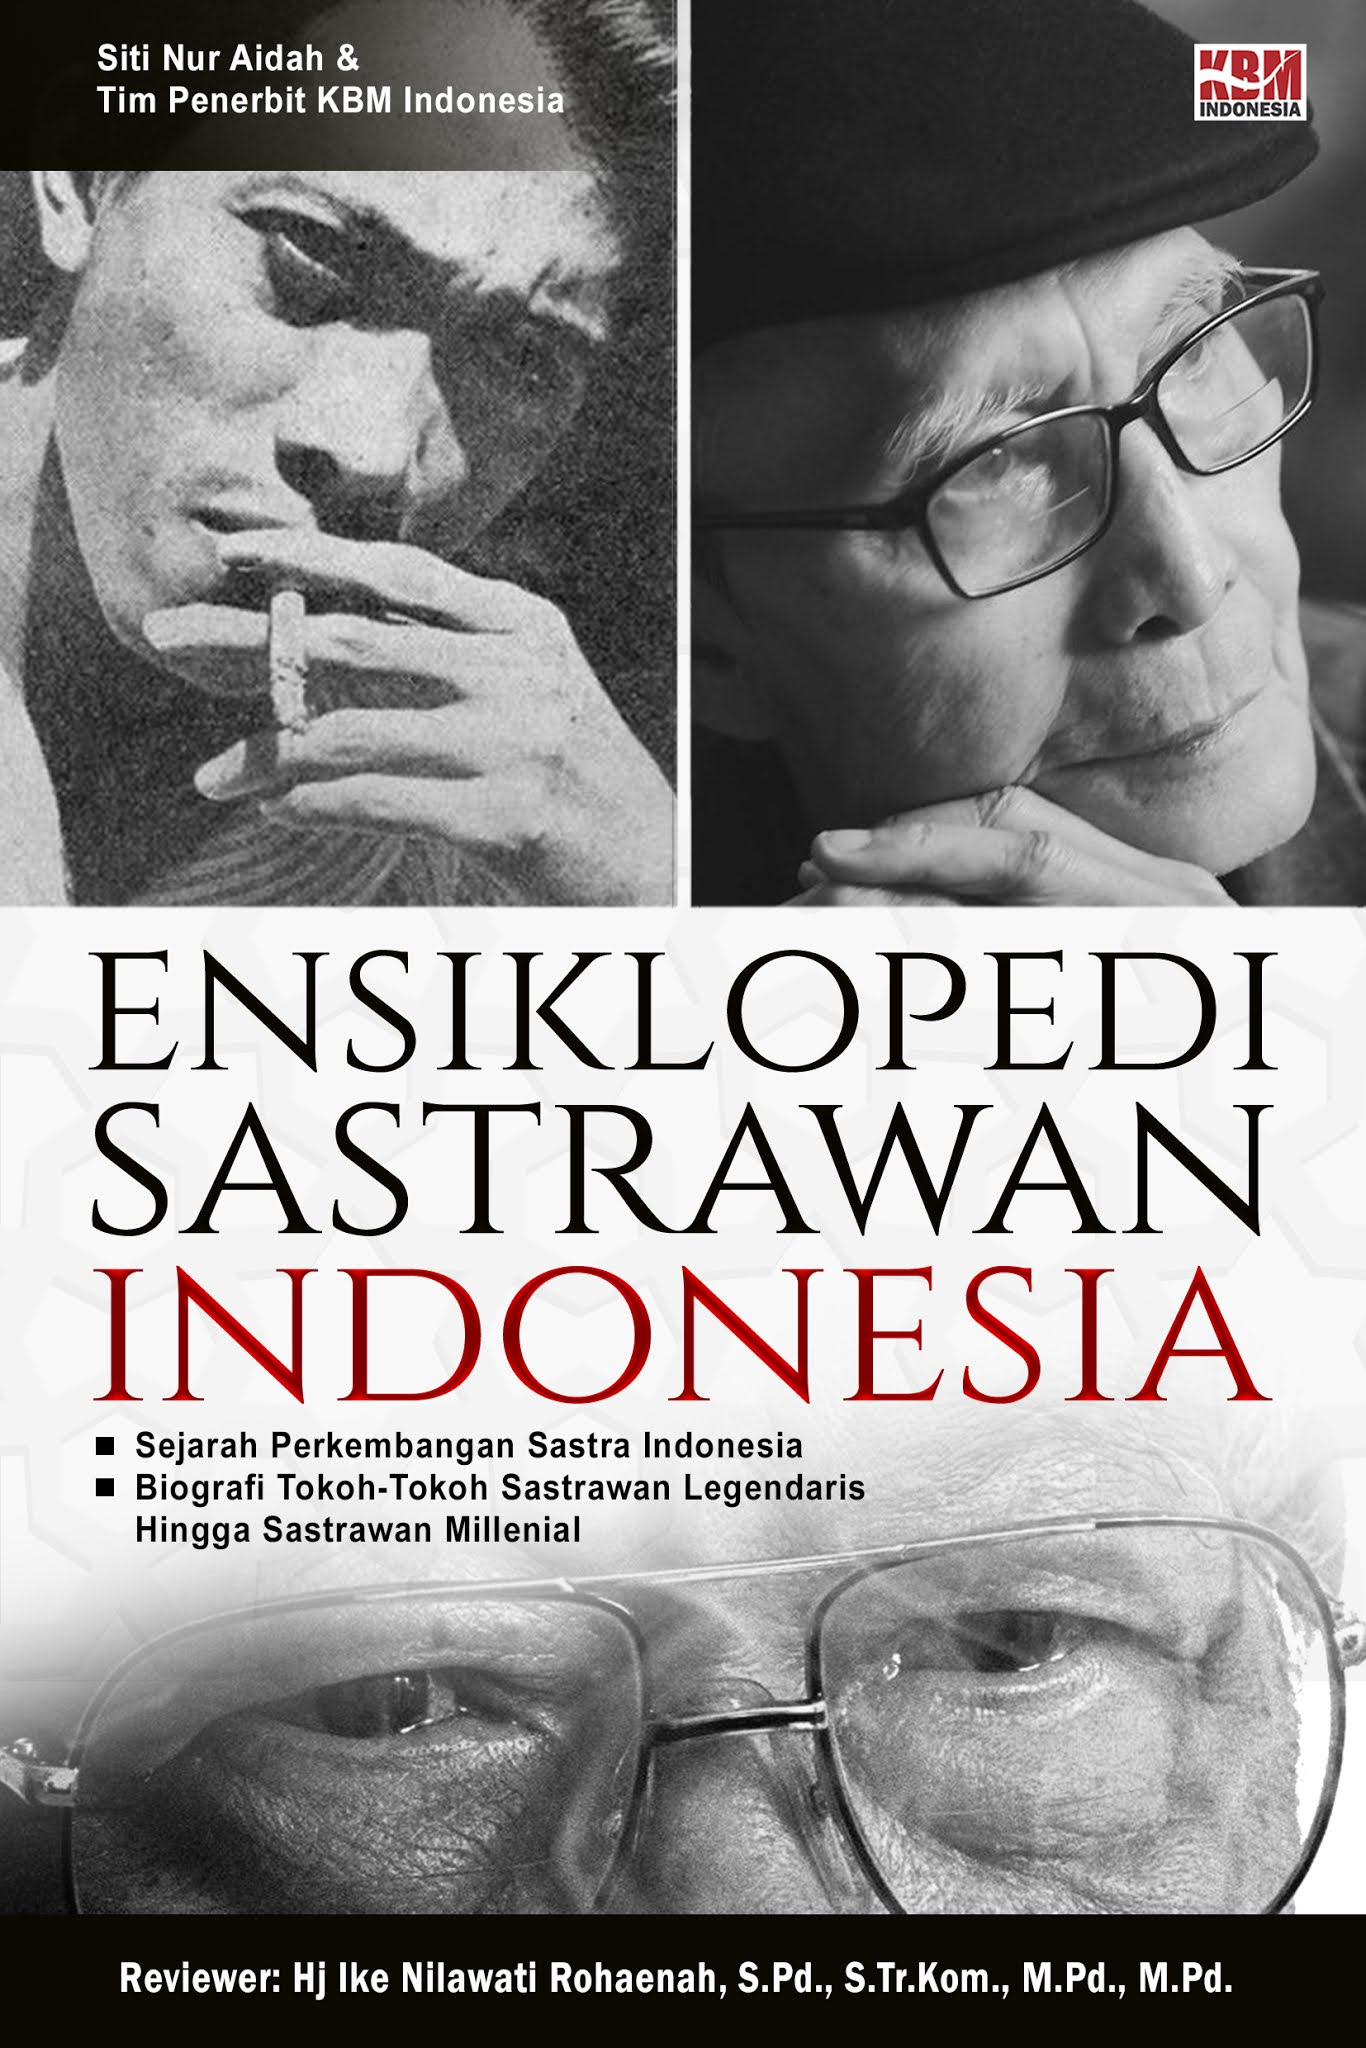 ENSIKLOPEDI SASTRAWAN INDONESIA